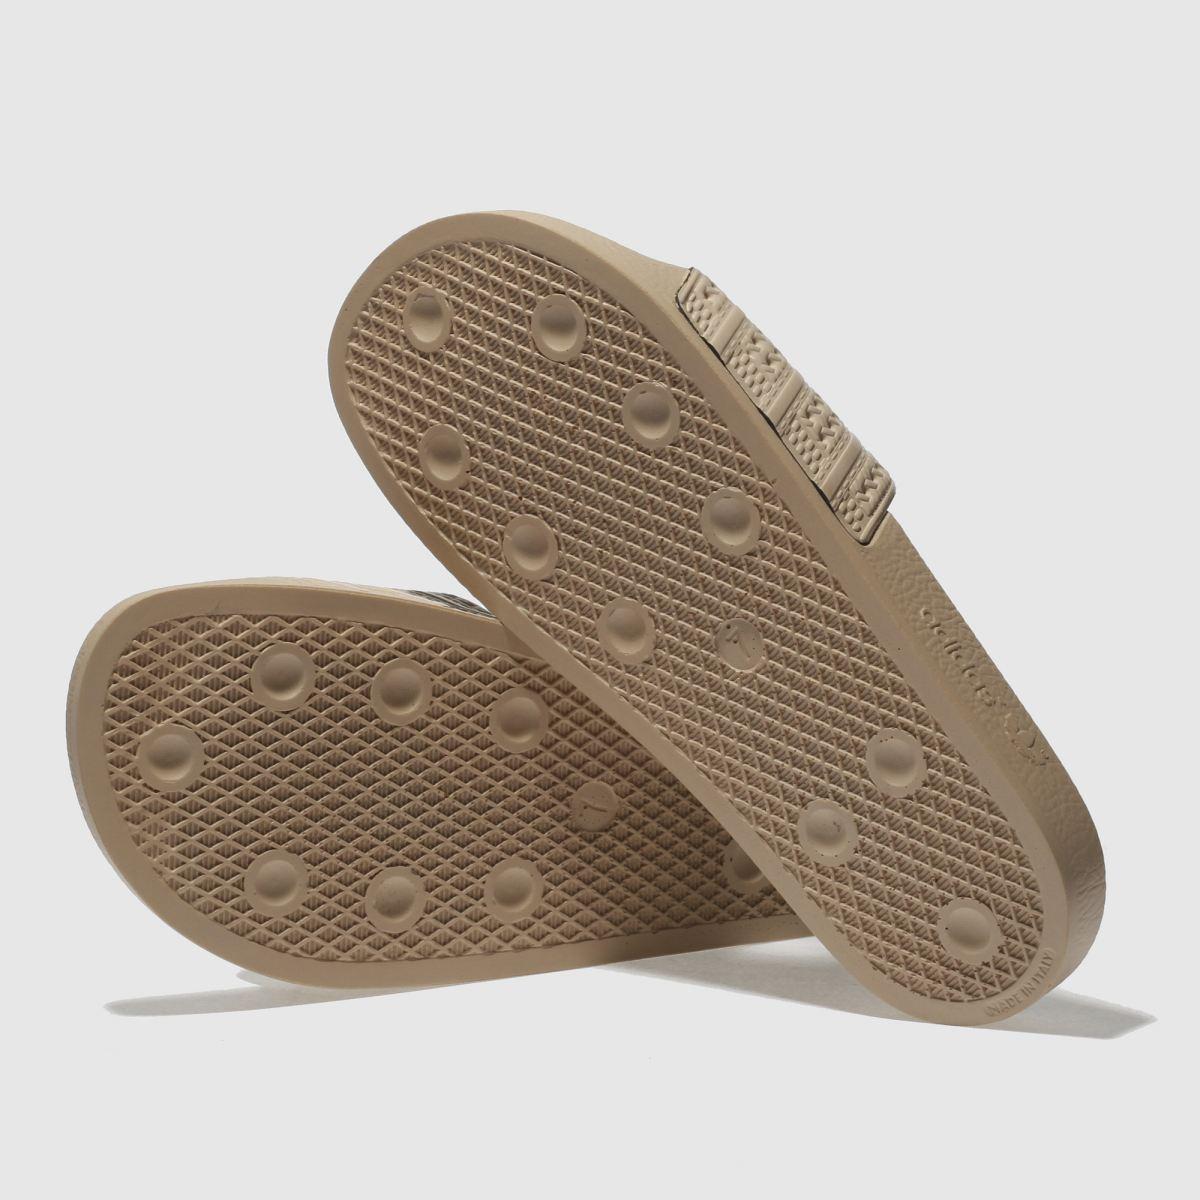 Damen Sandalen Naturfarben adidas Adilette Slide Sandalen Damen | schuh Gute Qualität beliebte Schuhe d429c6